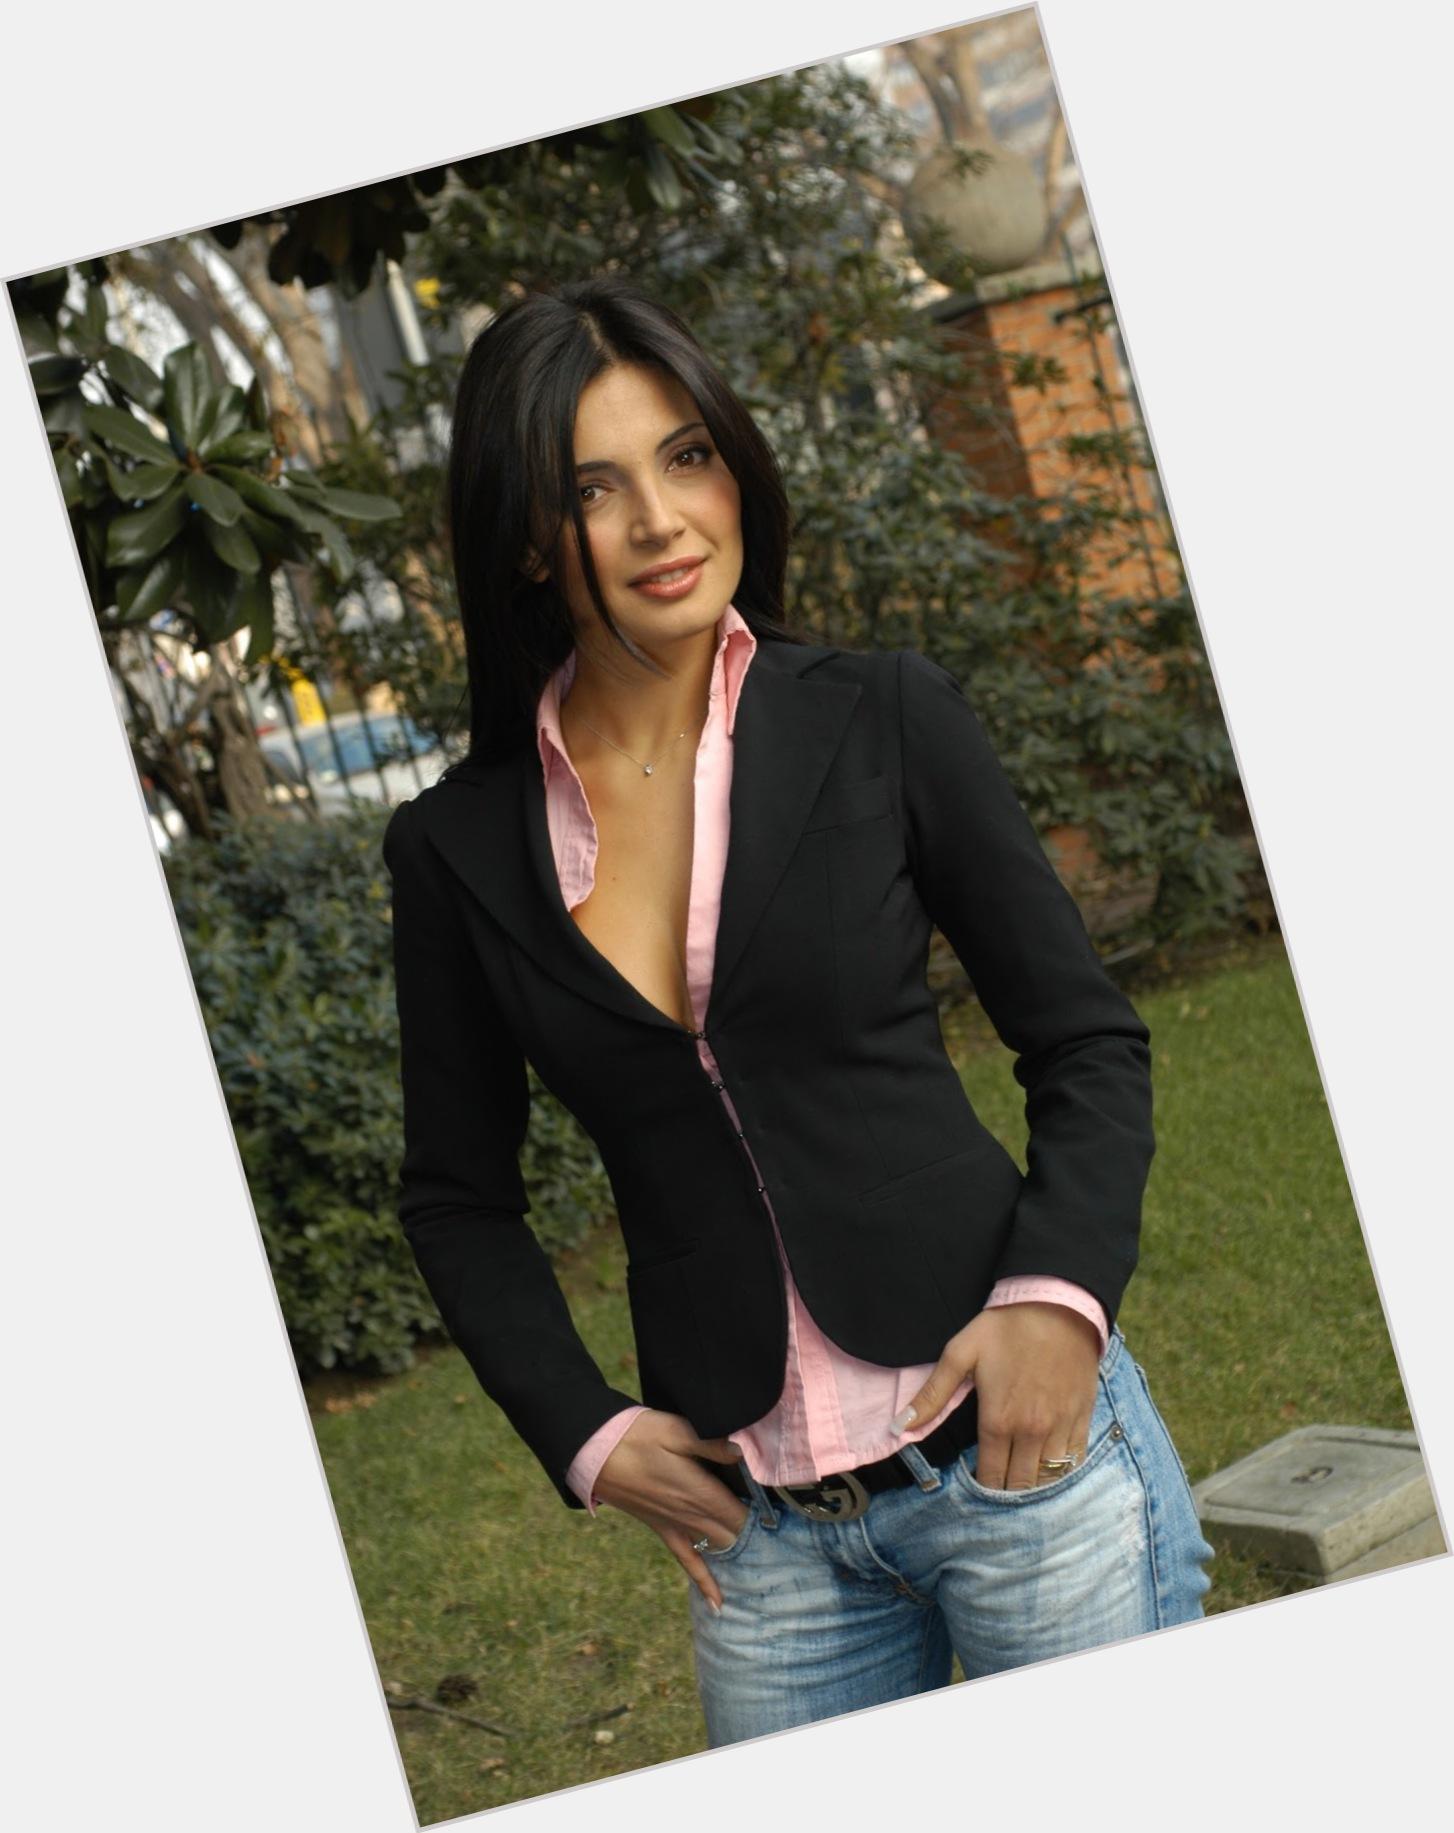 Alessia mancini nude downlod pics 21